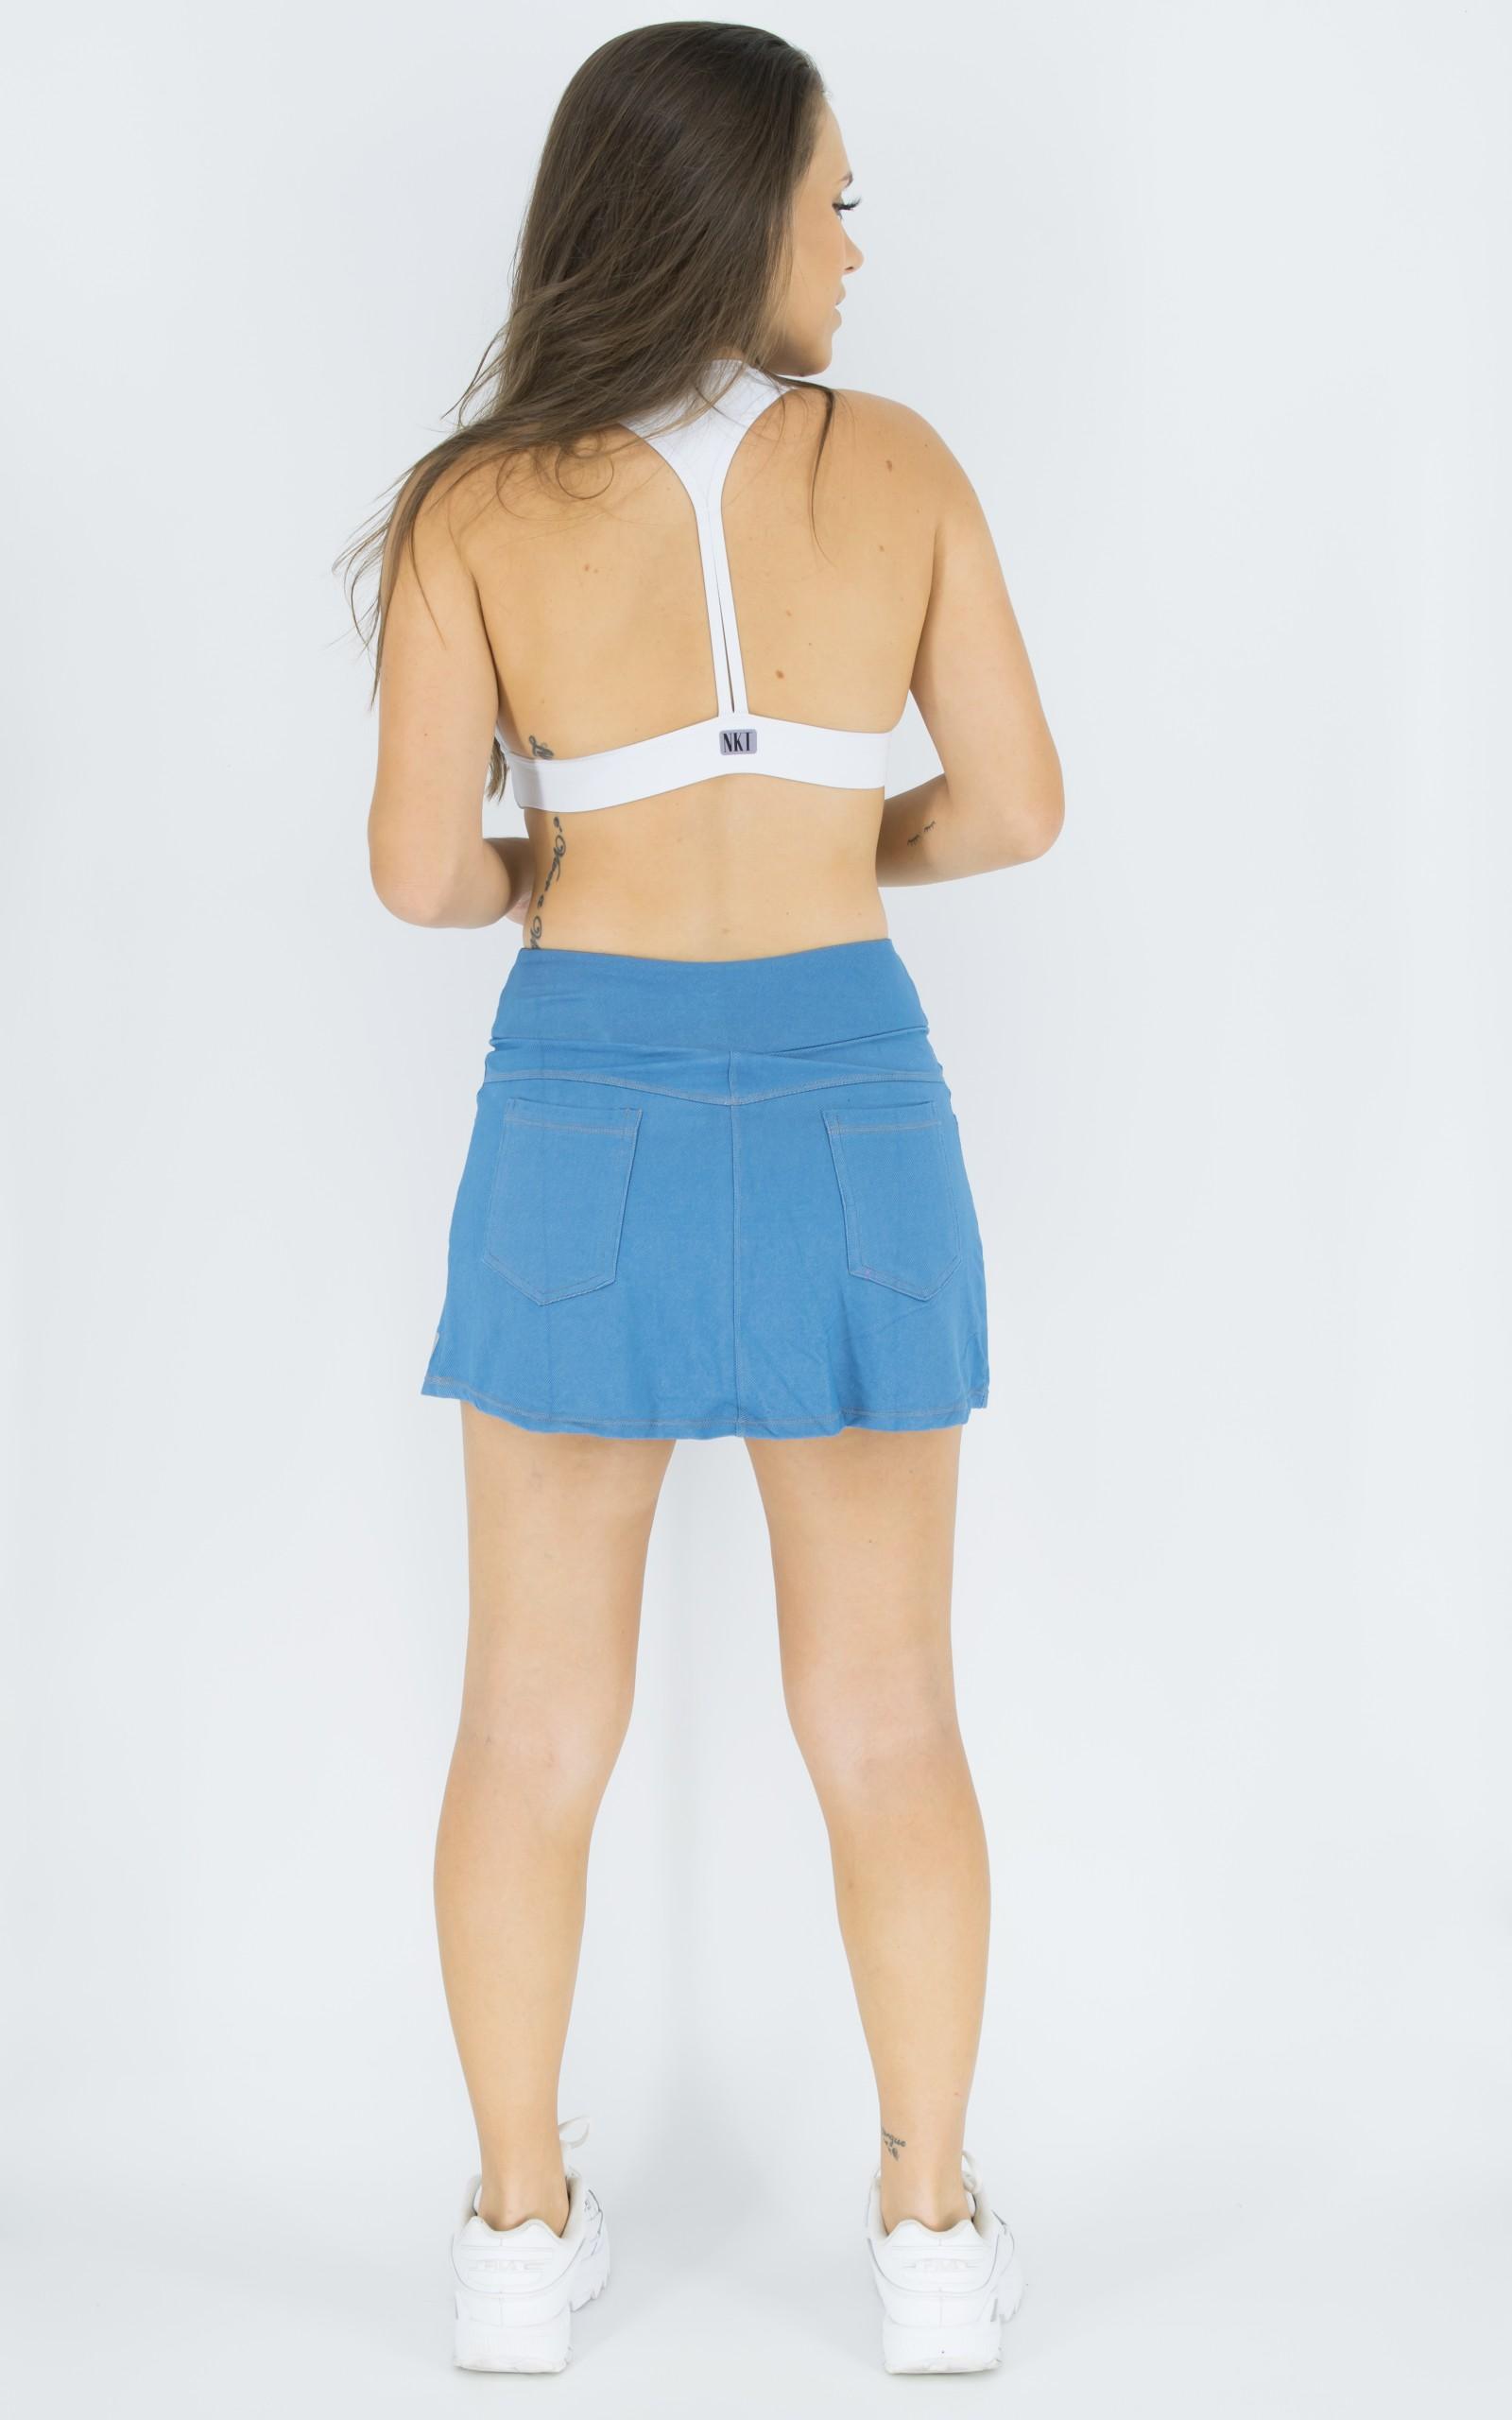 Saia Shorts Fluky Jeans Claro, Coleção Move Your Body - NKT Fitwear Moda Fitness